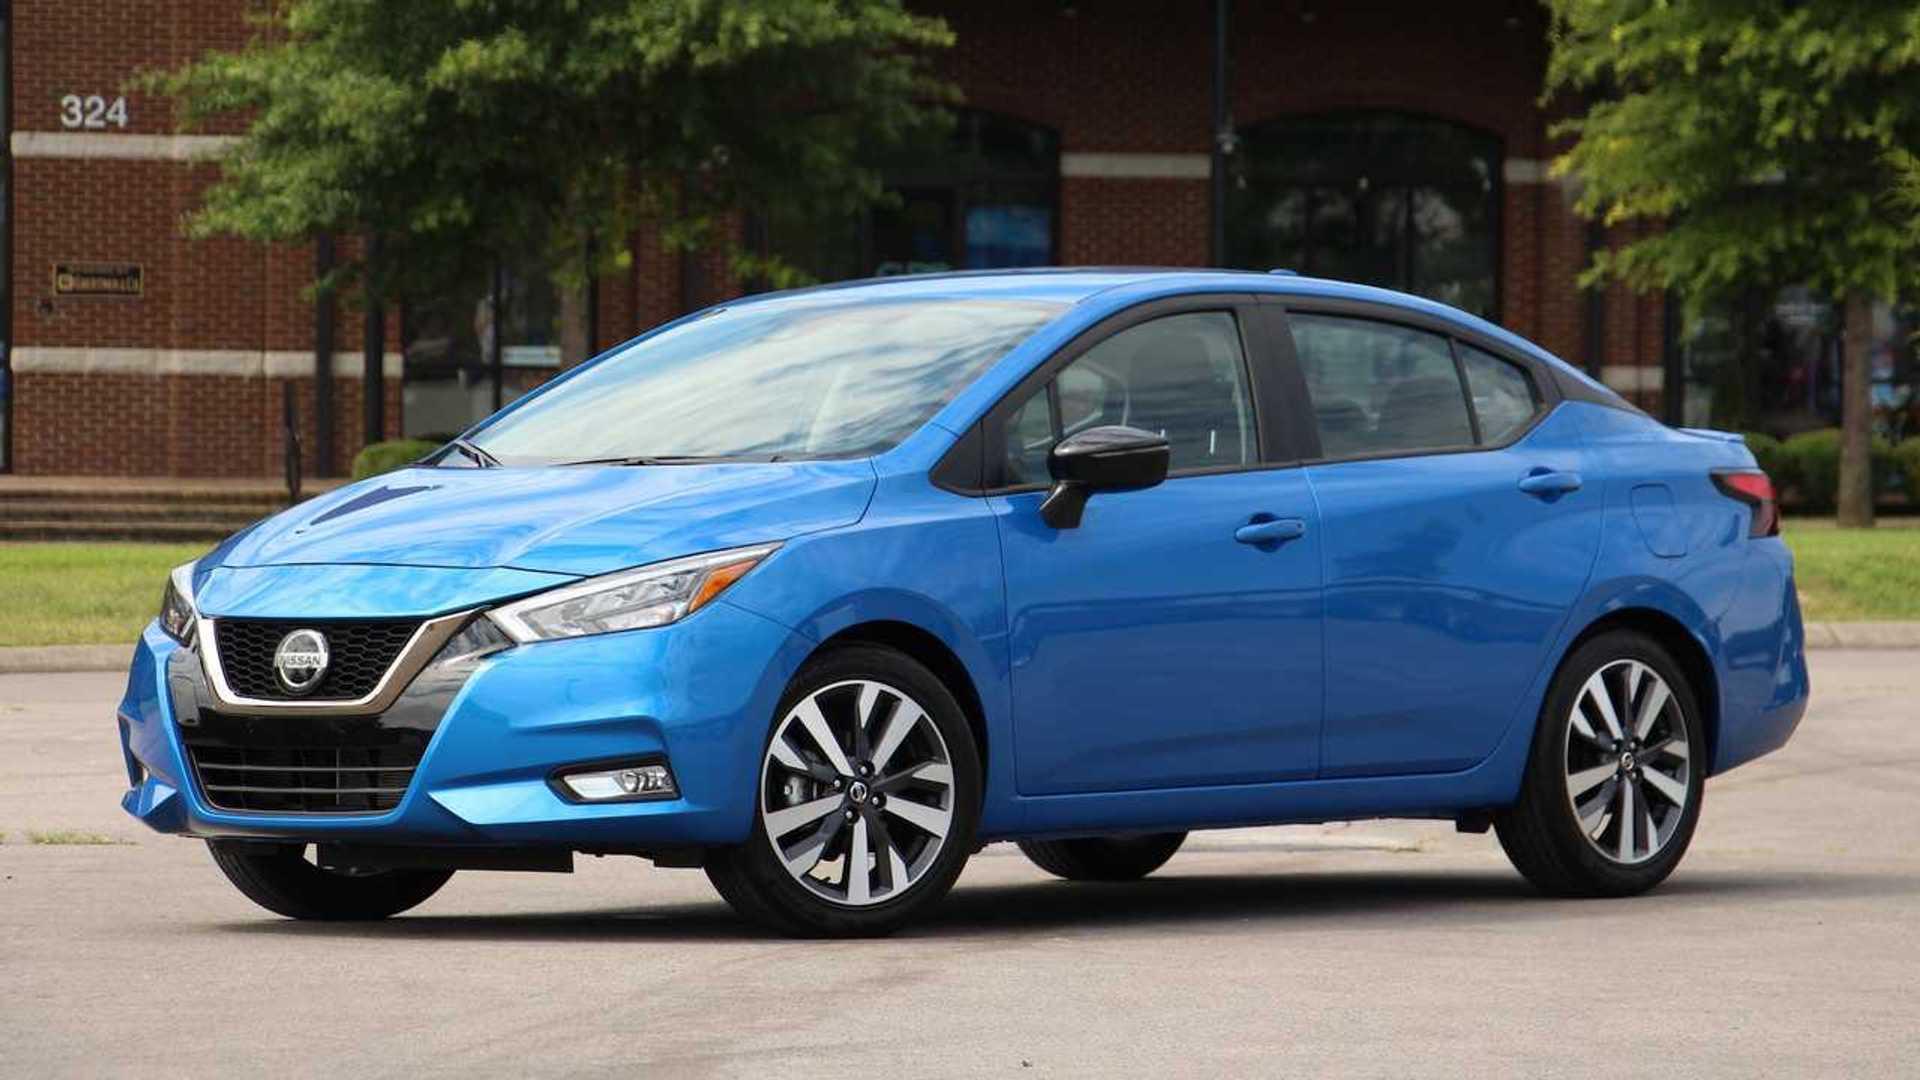 2020 Nissan Versa First Drive: Safety First